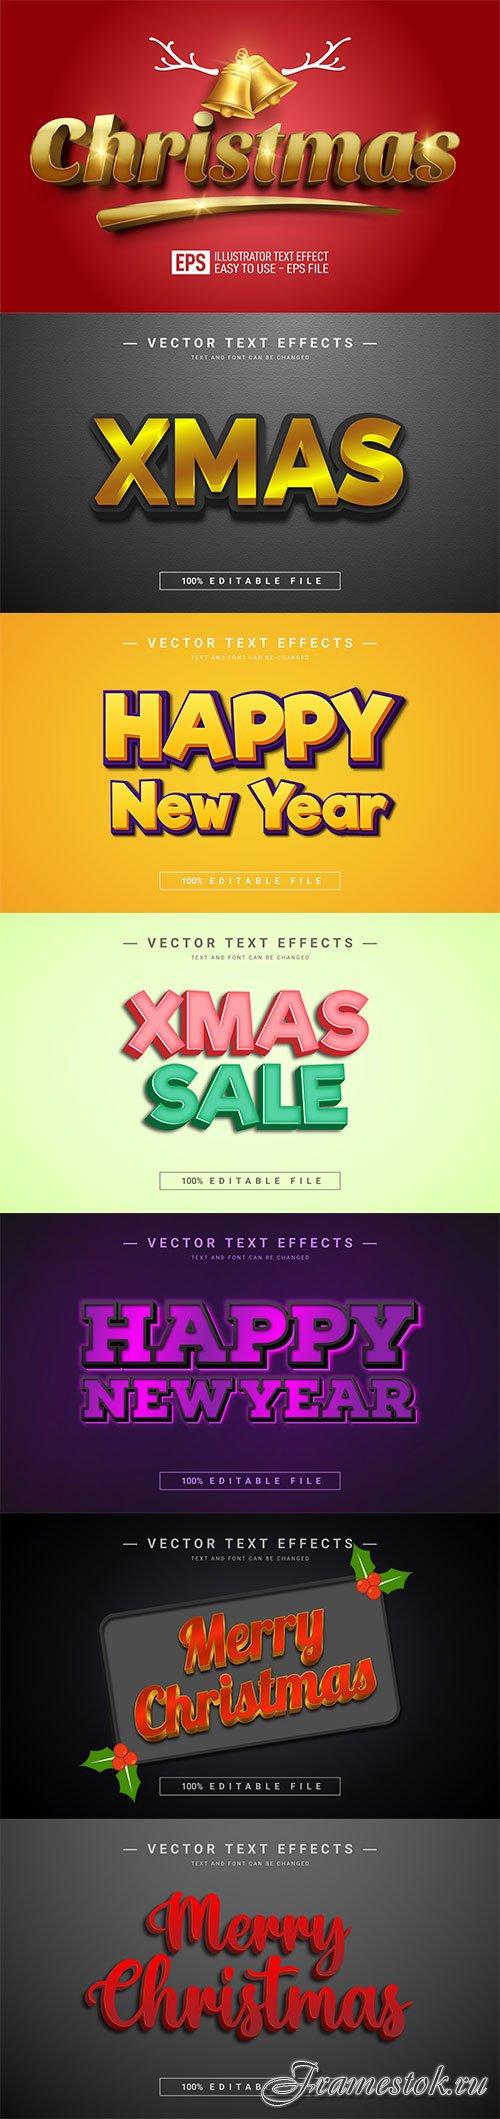 2022 New year, Merry christmas editable text effect premium vector vol 16